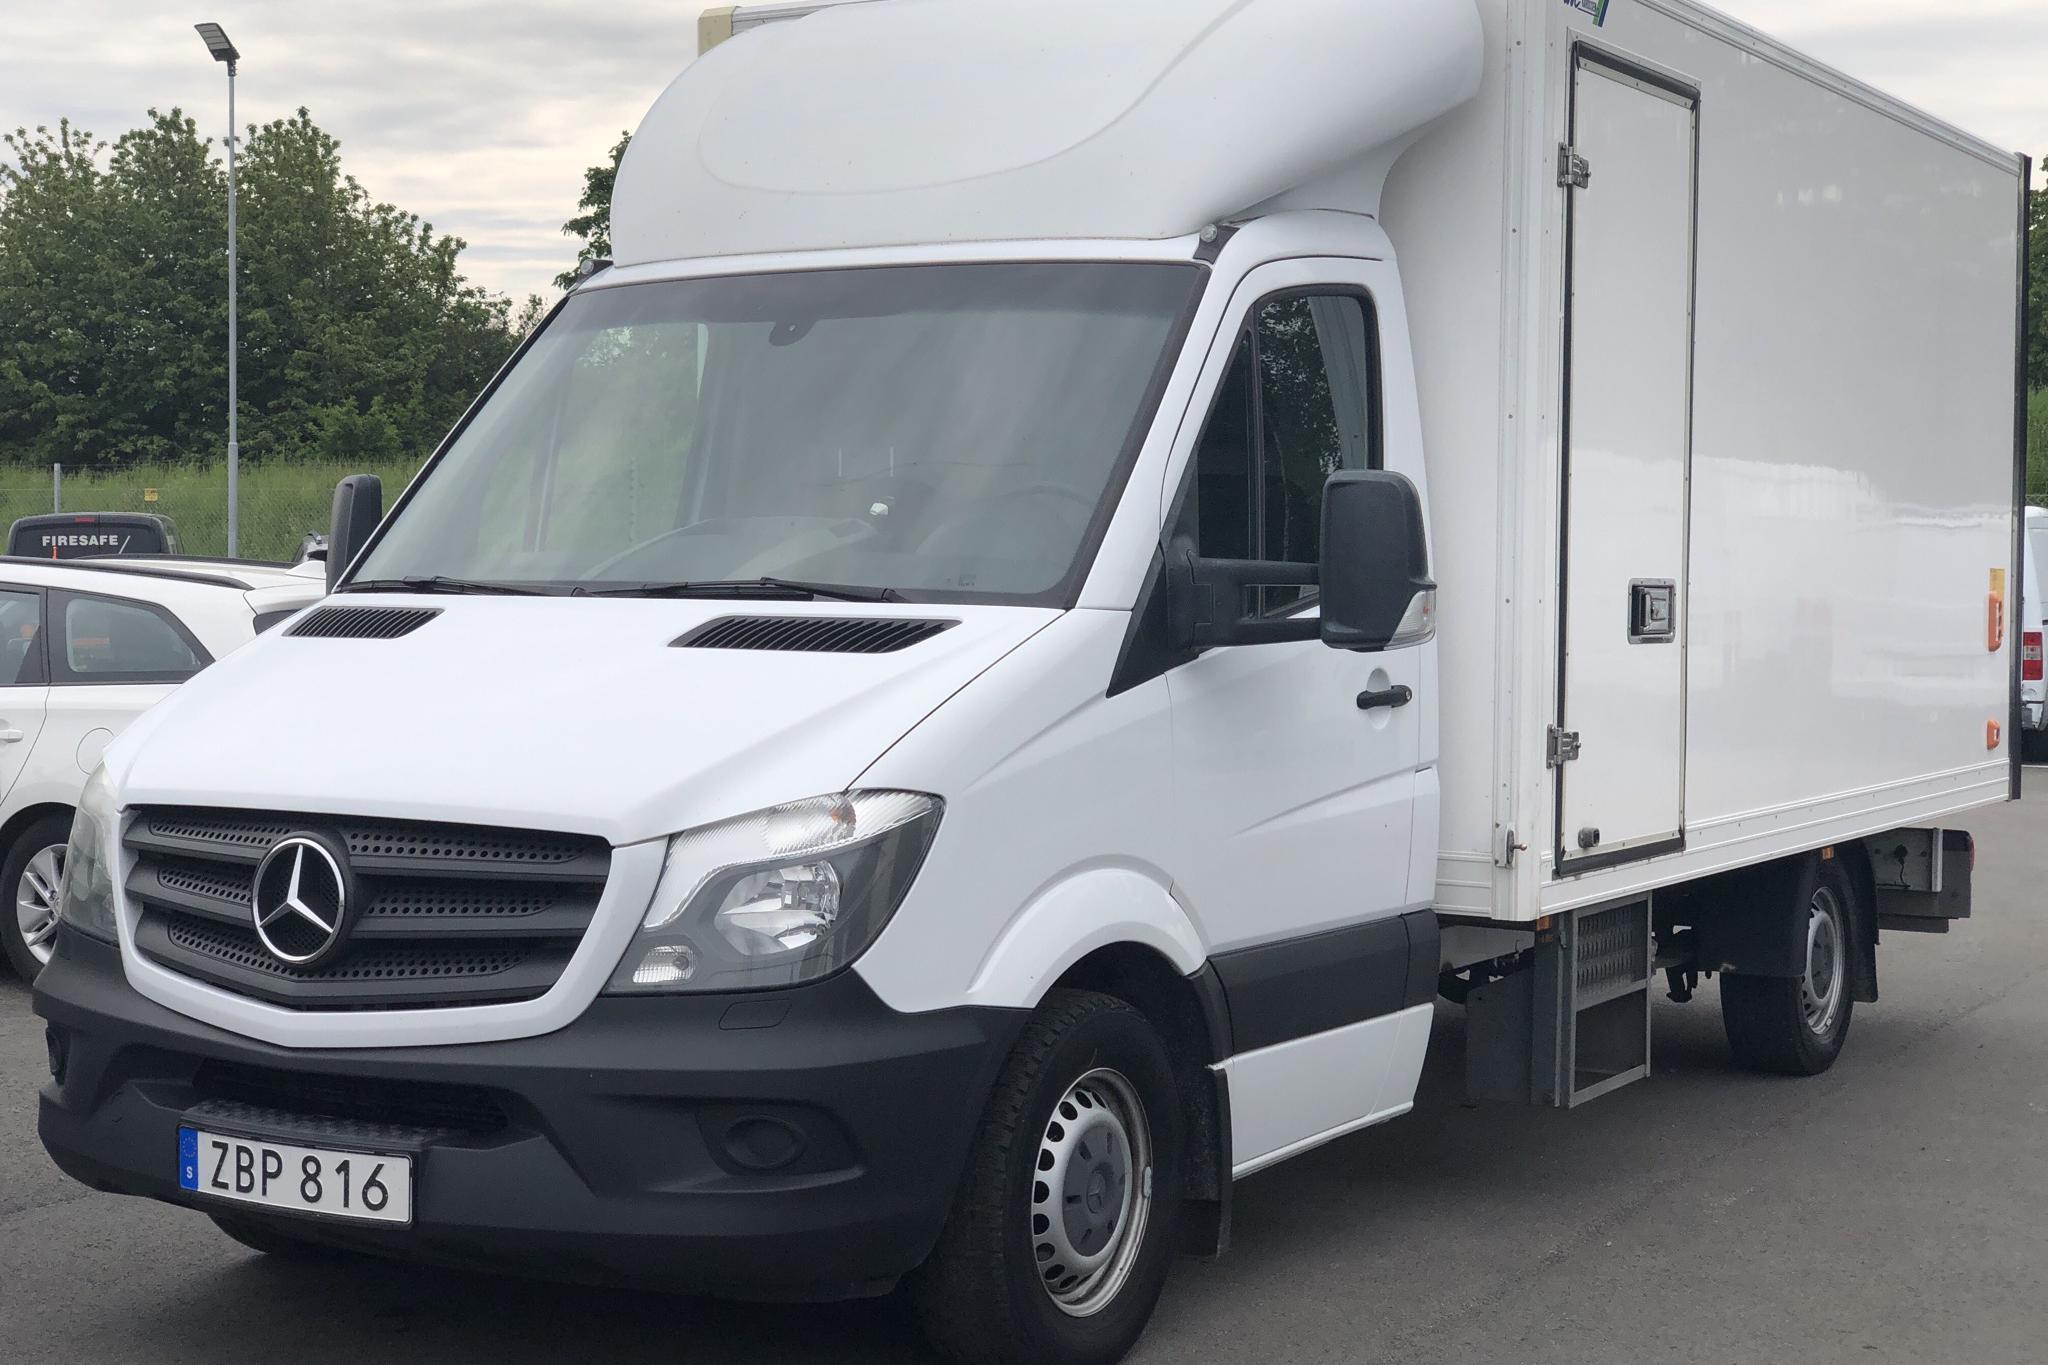 Mercedes Sprinter 316 CDI Volymskåp (163hk) - 200 500 km - Automatic - white - 2018